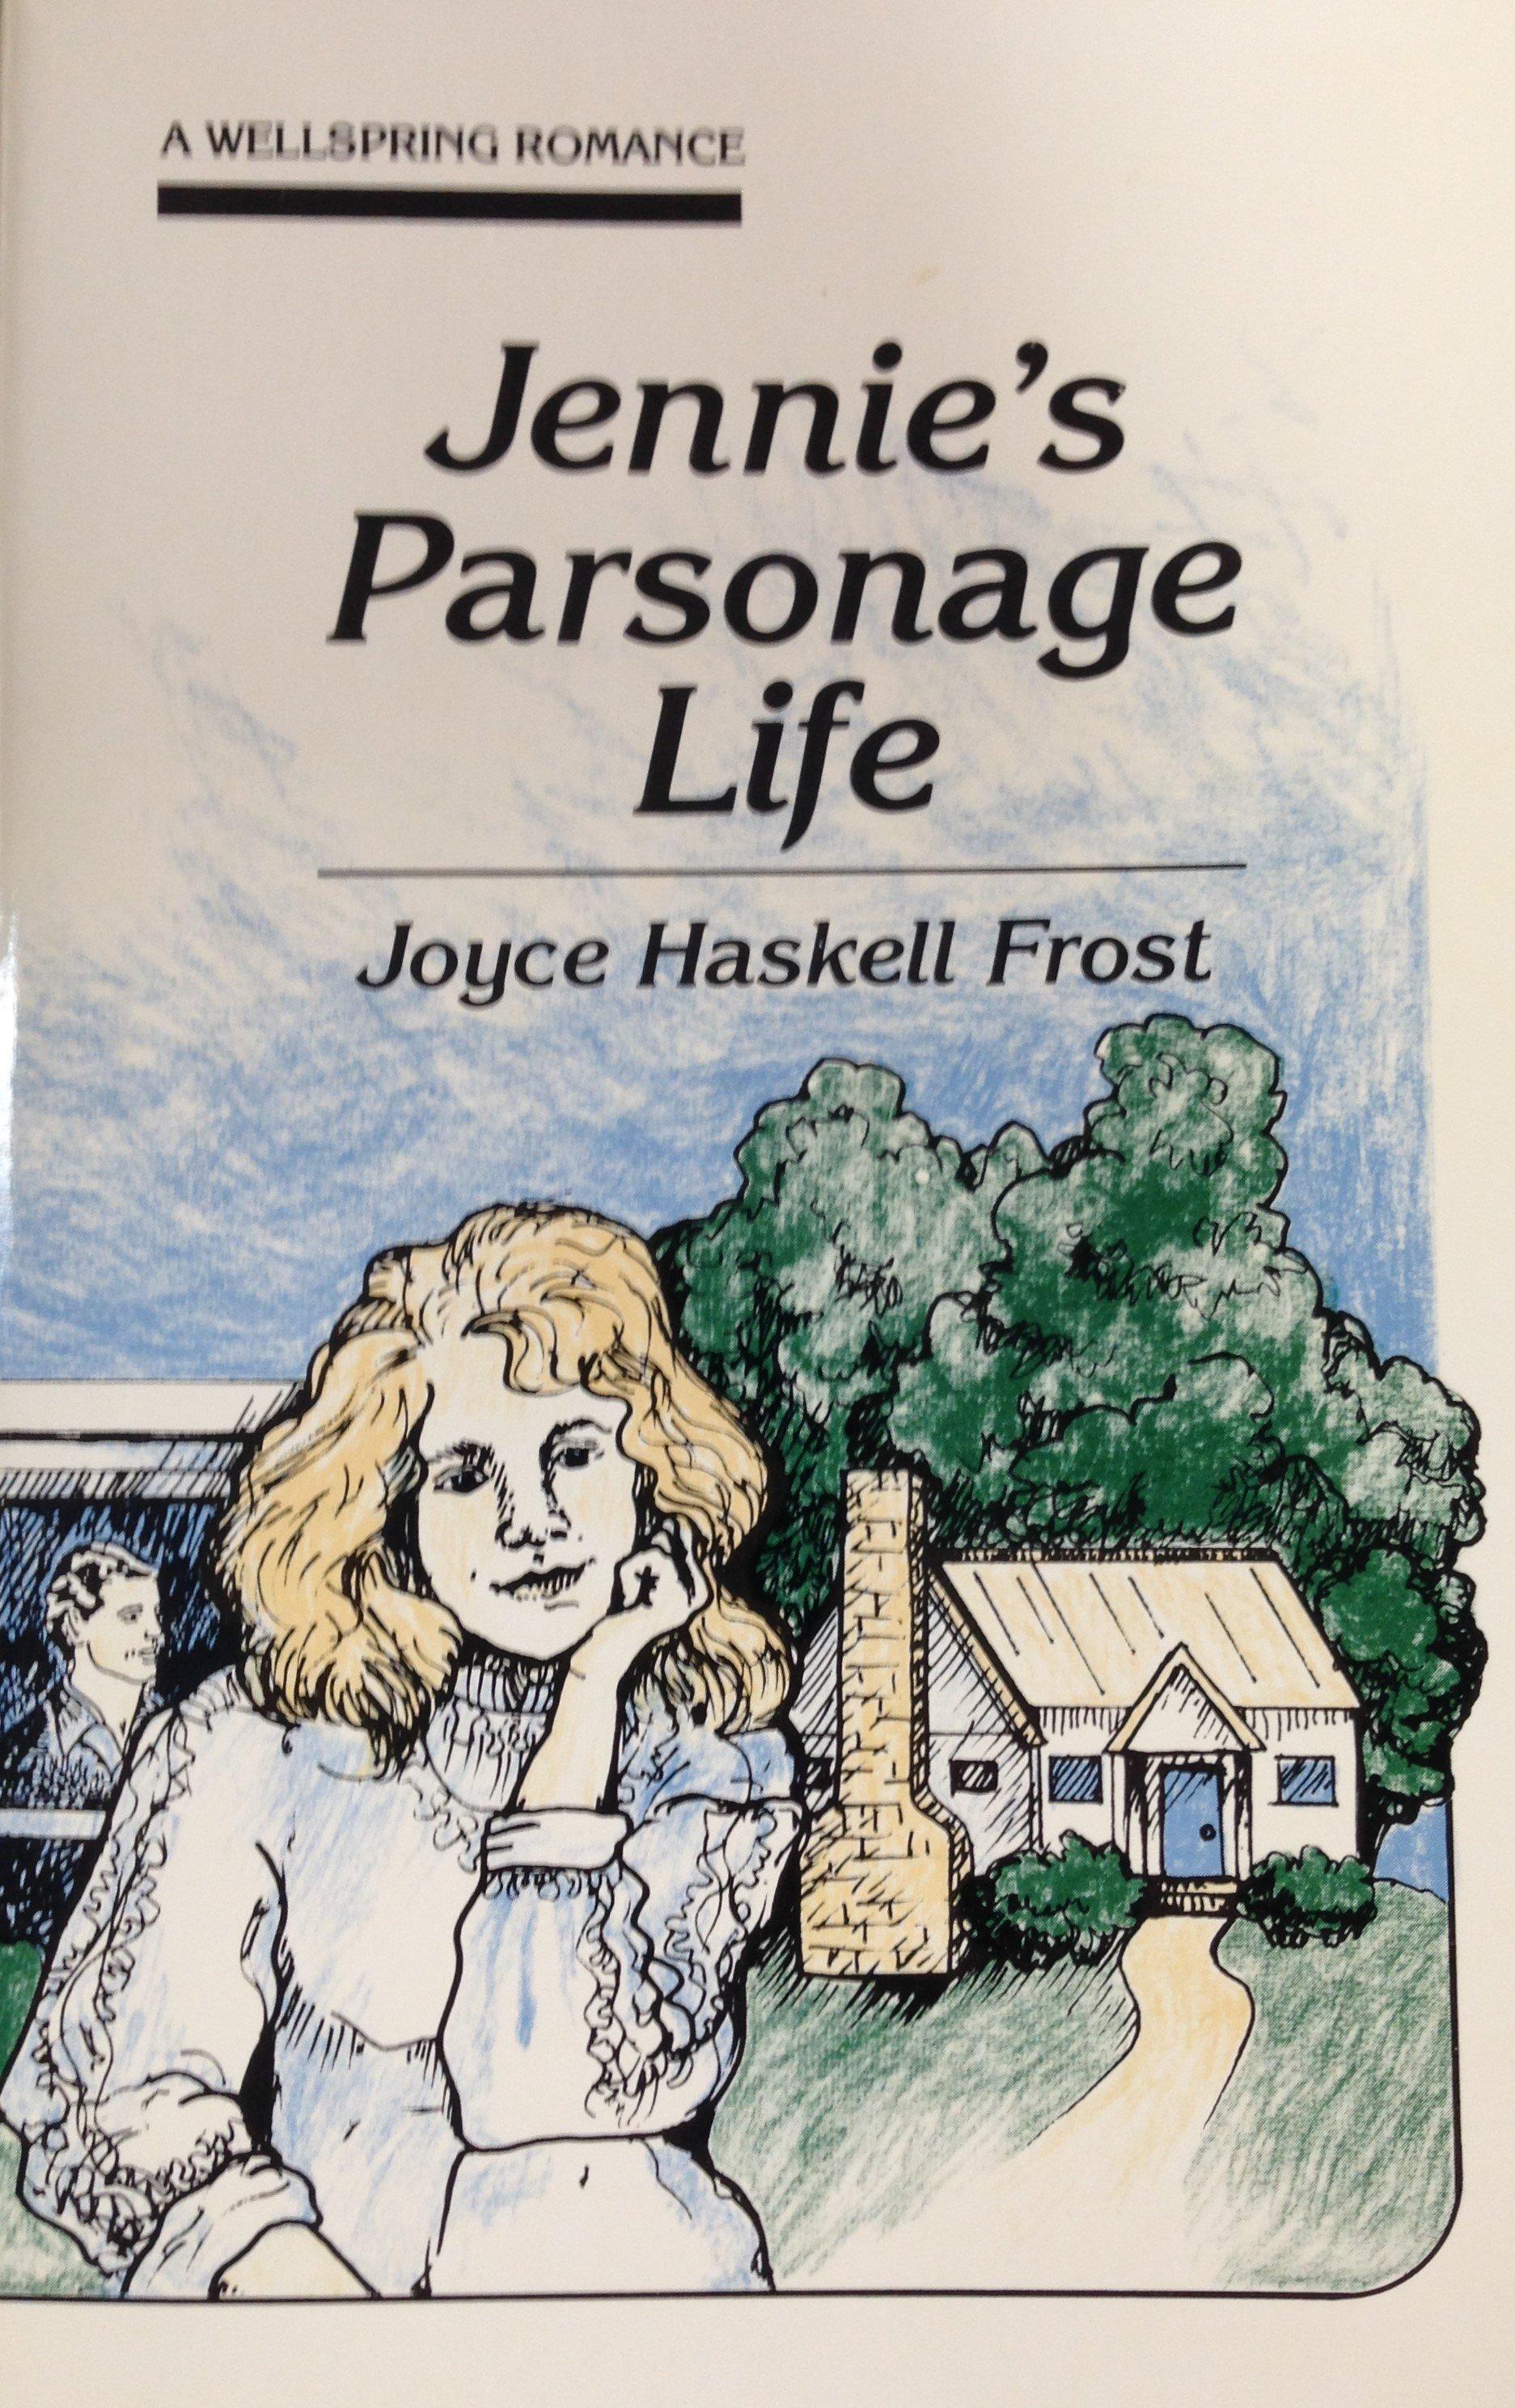 Jennie's Parsonage Life:  A Wellspring Romance by Joyce Haskell Frost 00110